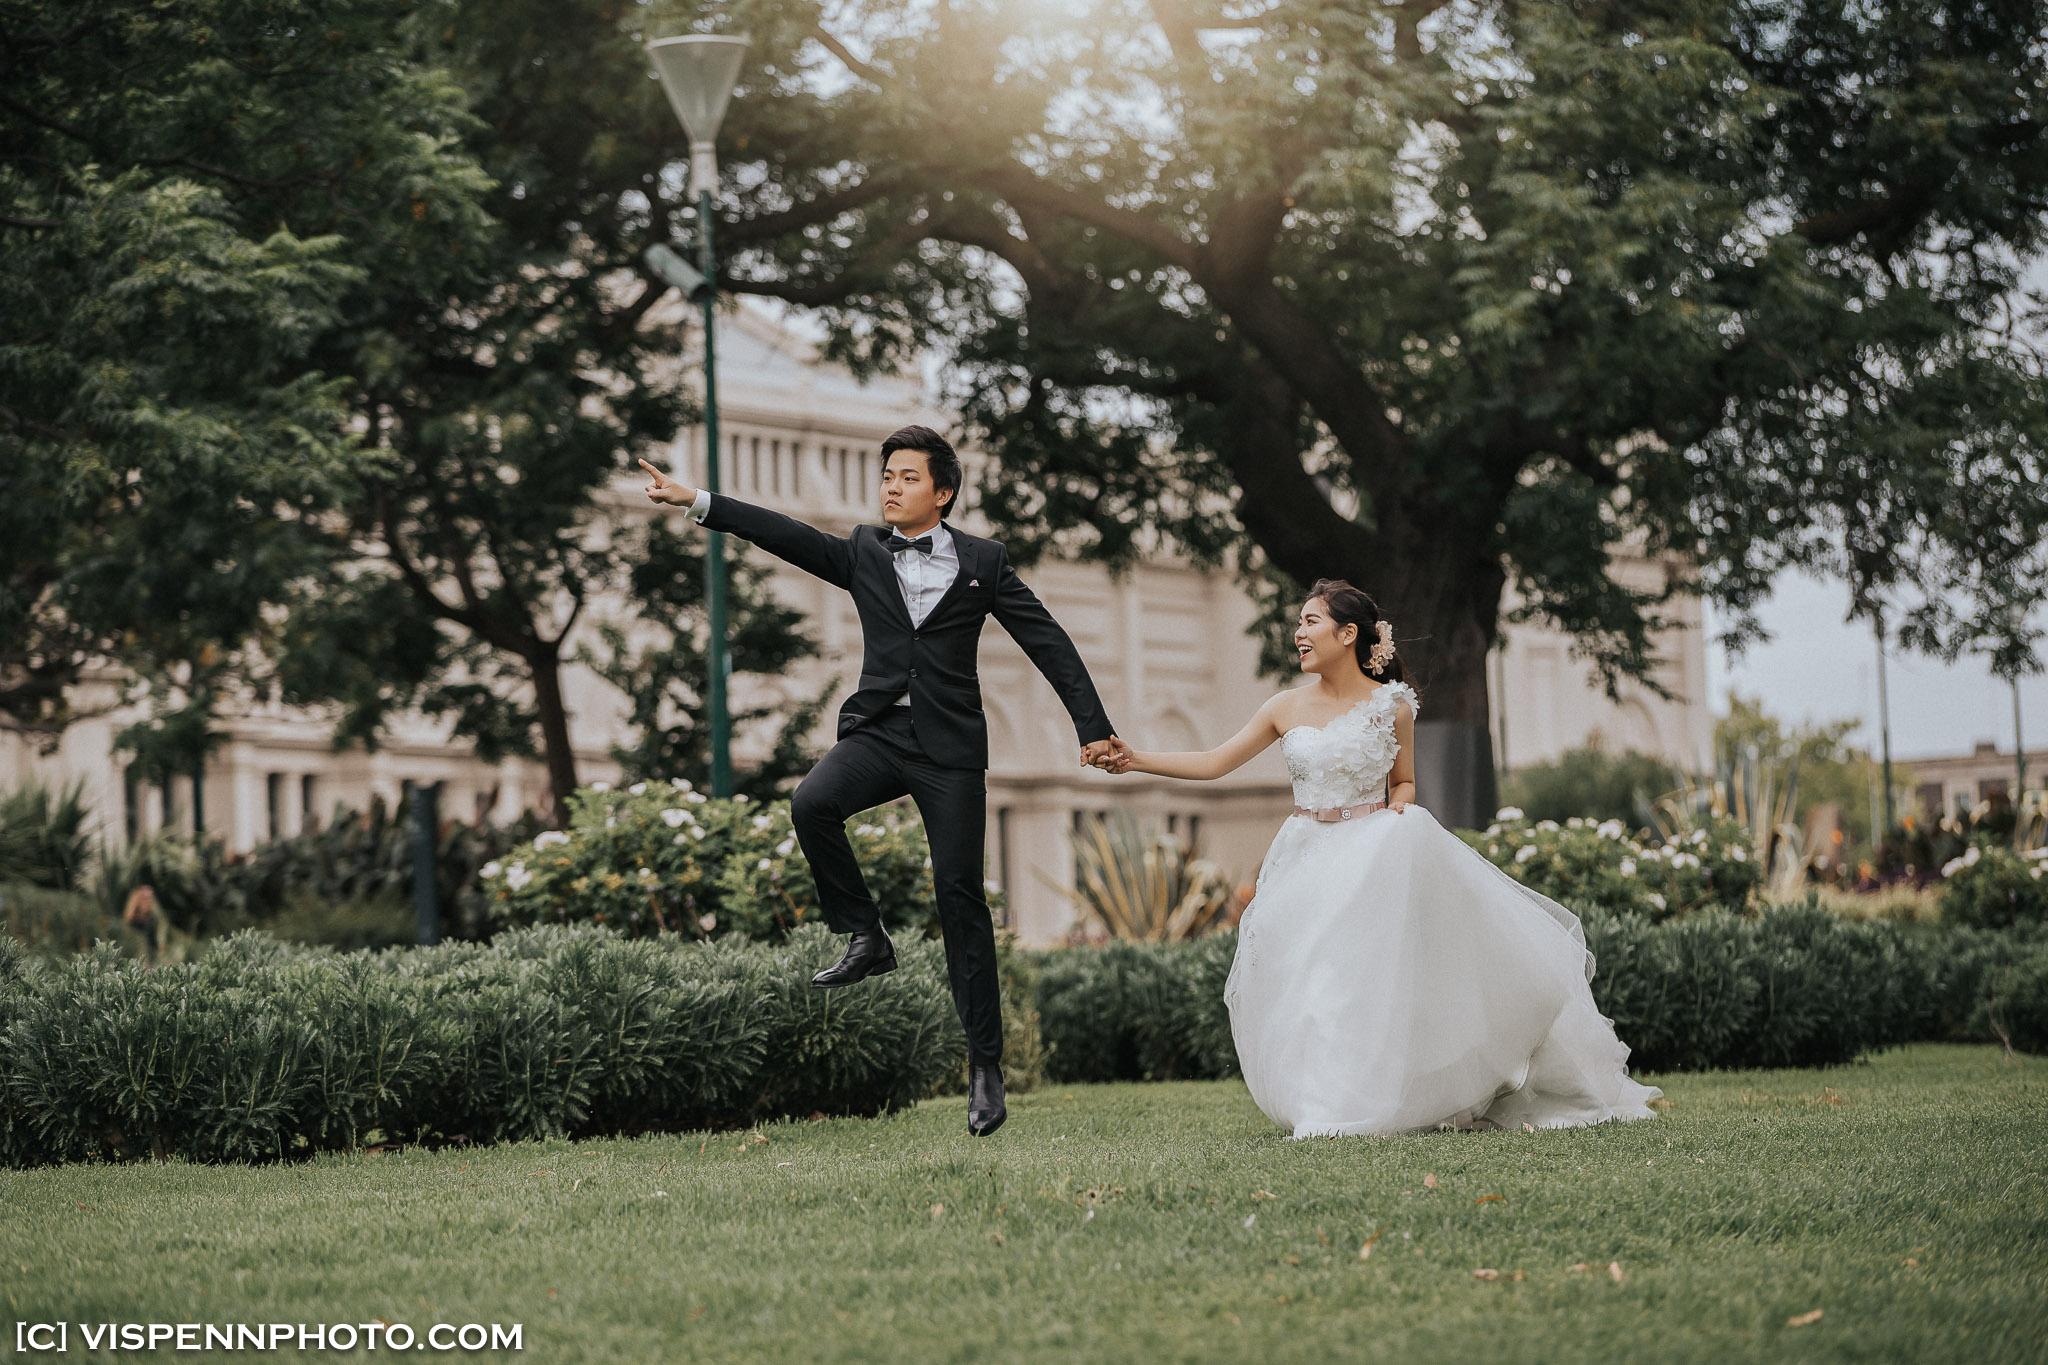 PRE WEDDING Photography Melbourne VISPENN 墨尔本 婚纱照 结婚照 婚纱摄影 1DX 1604